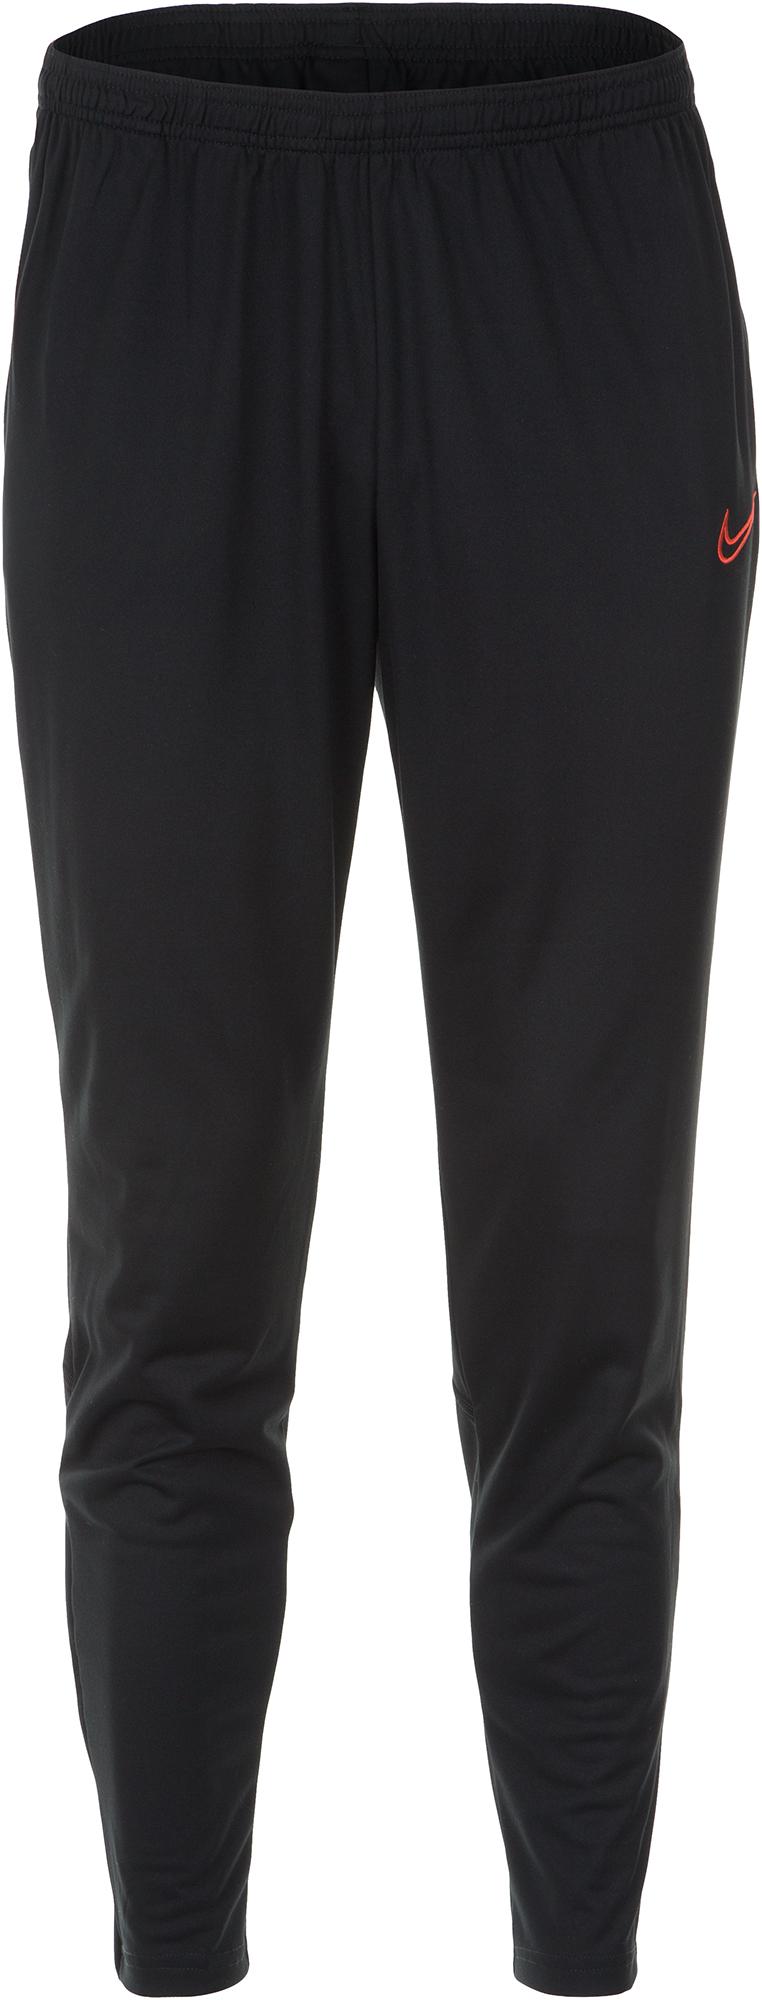 Nike Брюки мужские Nike Academy, размер 52-54 брюки мужские sela цвет темно серый меланж pk 2415 012 8310 размер xxl 54